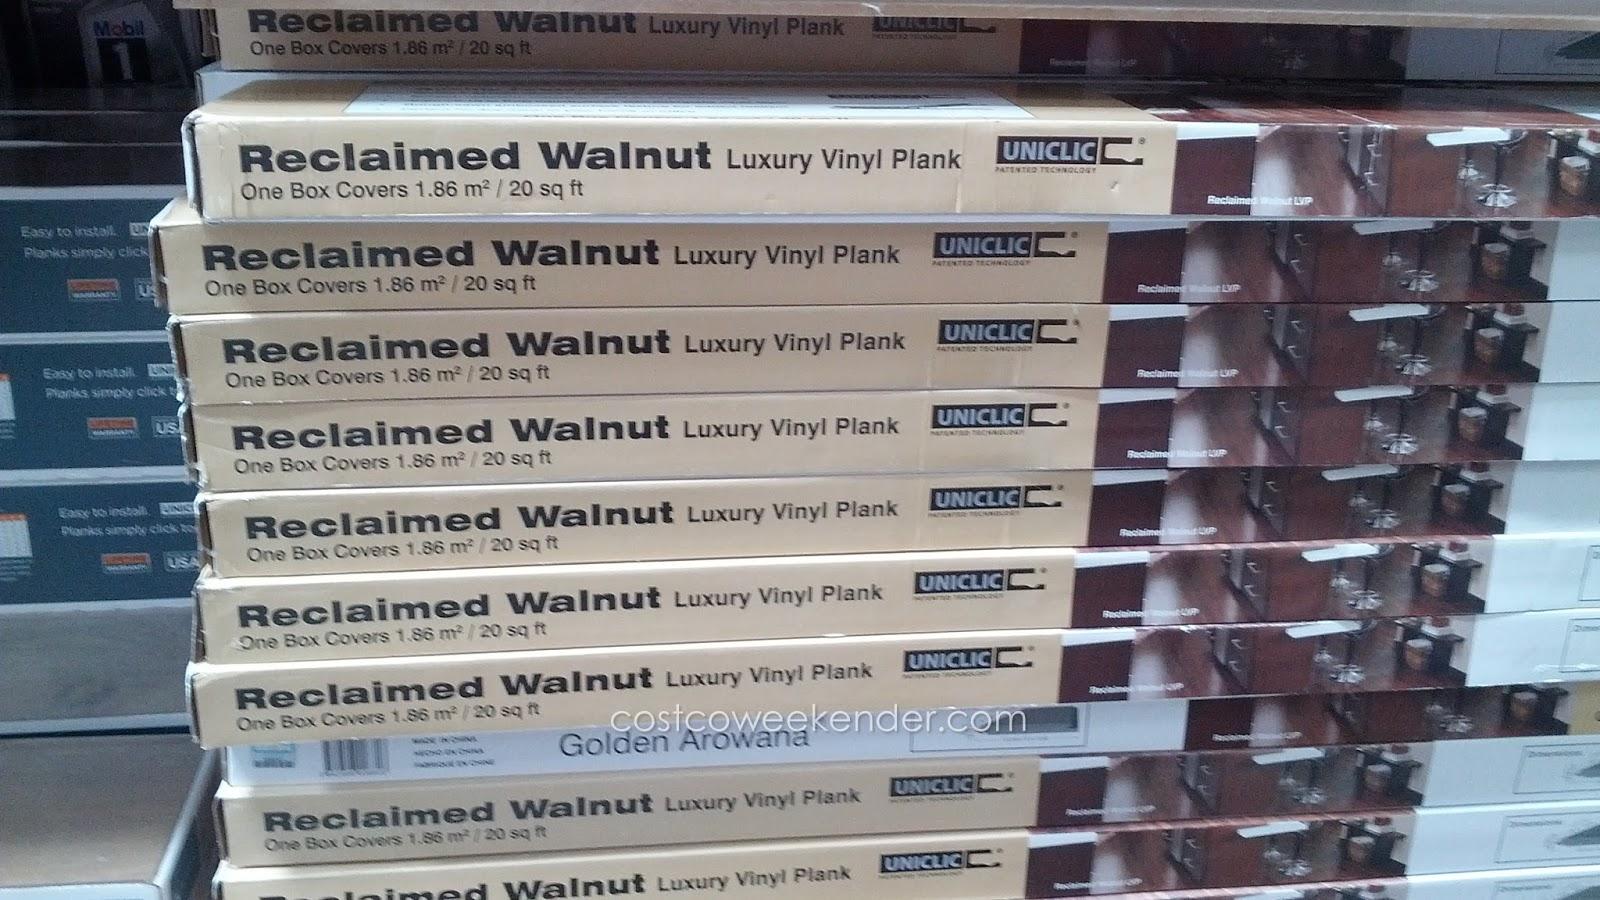 Golden Arowana Reclaimed Walnut Luxury Vinyl Plank Cost Effective Alternative To Hardwood Floors